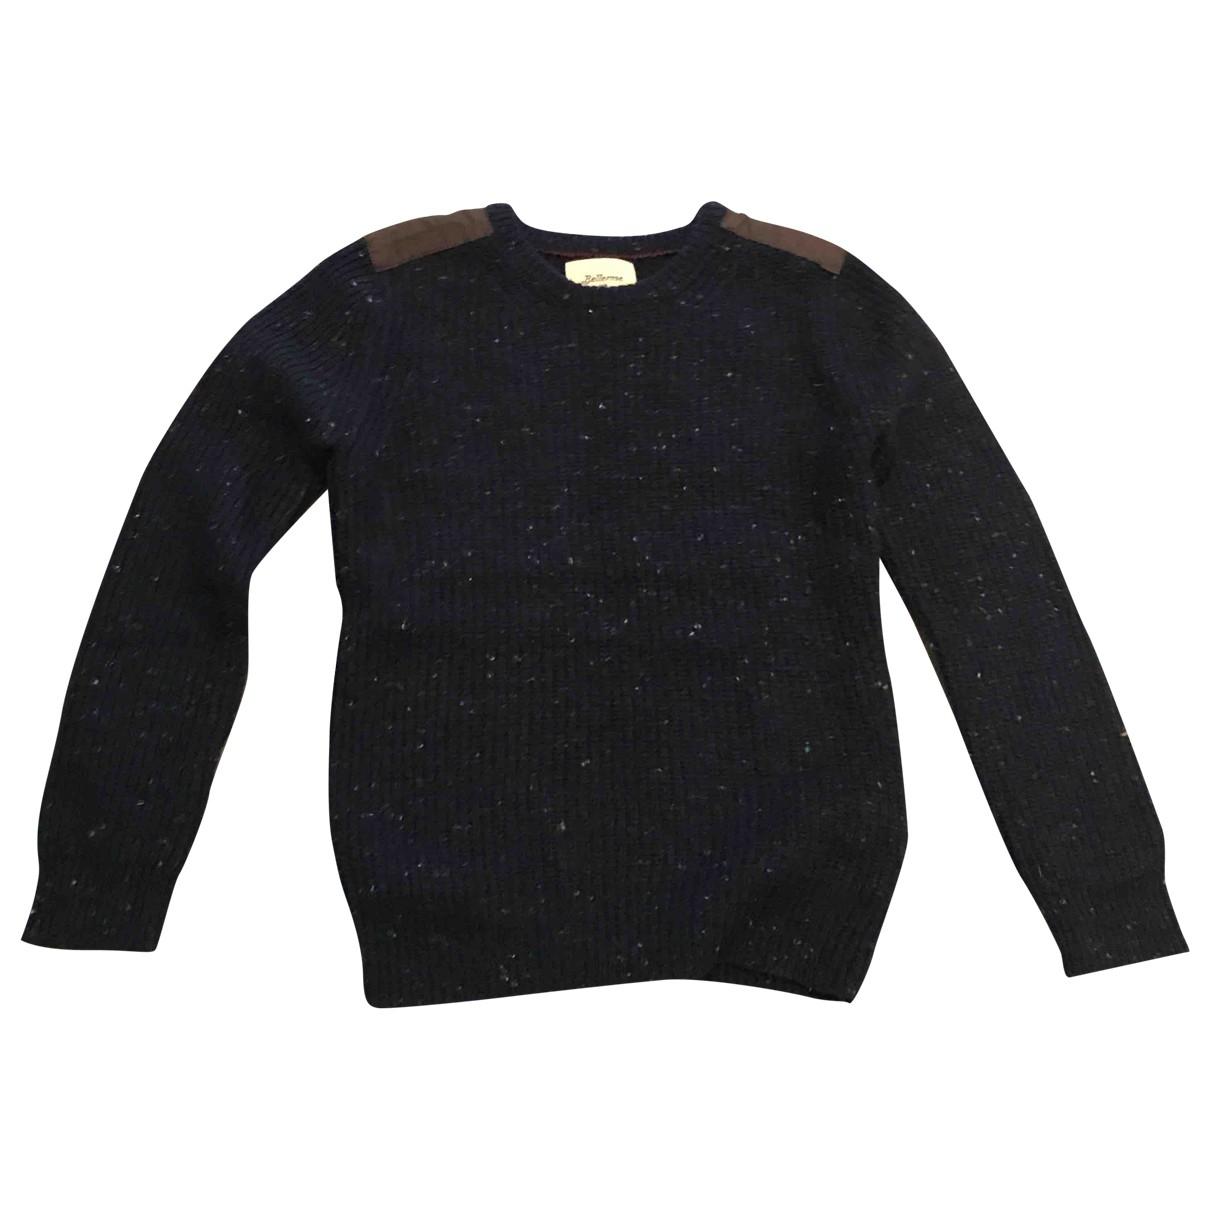 Bellerose \N Blue Wool Knitwear for Kids 6 years - up to 114cm FR